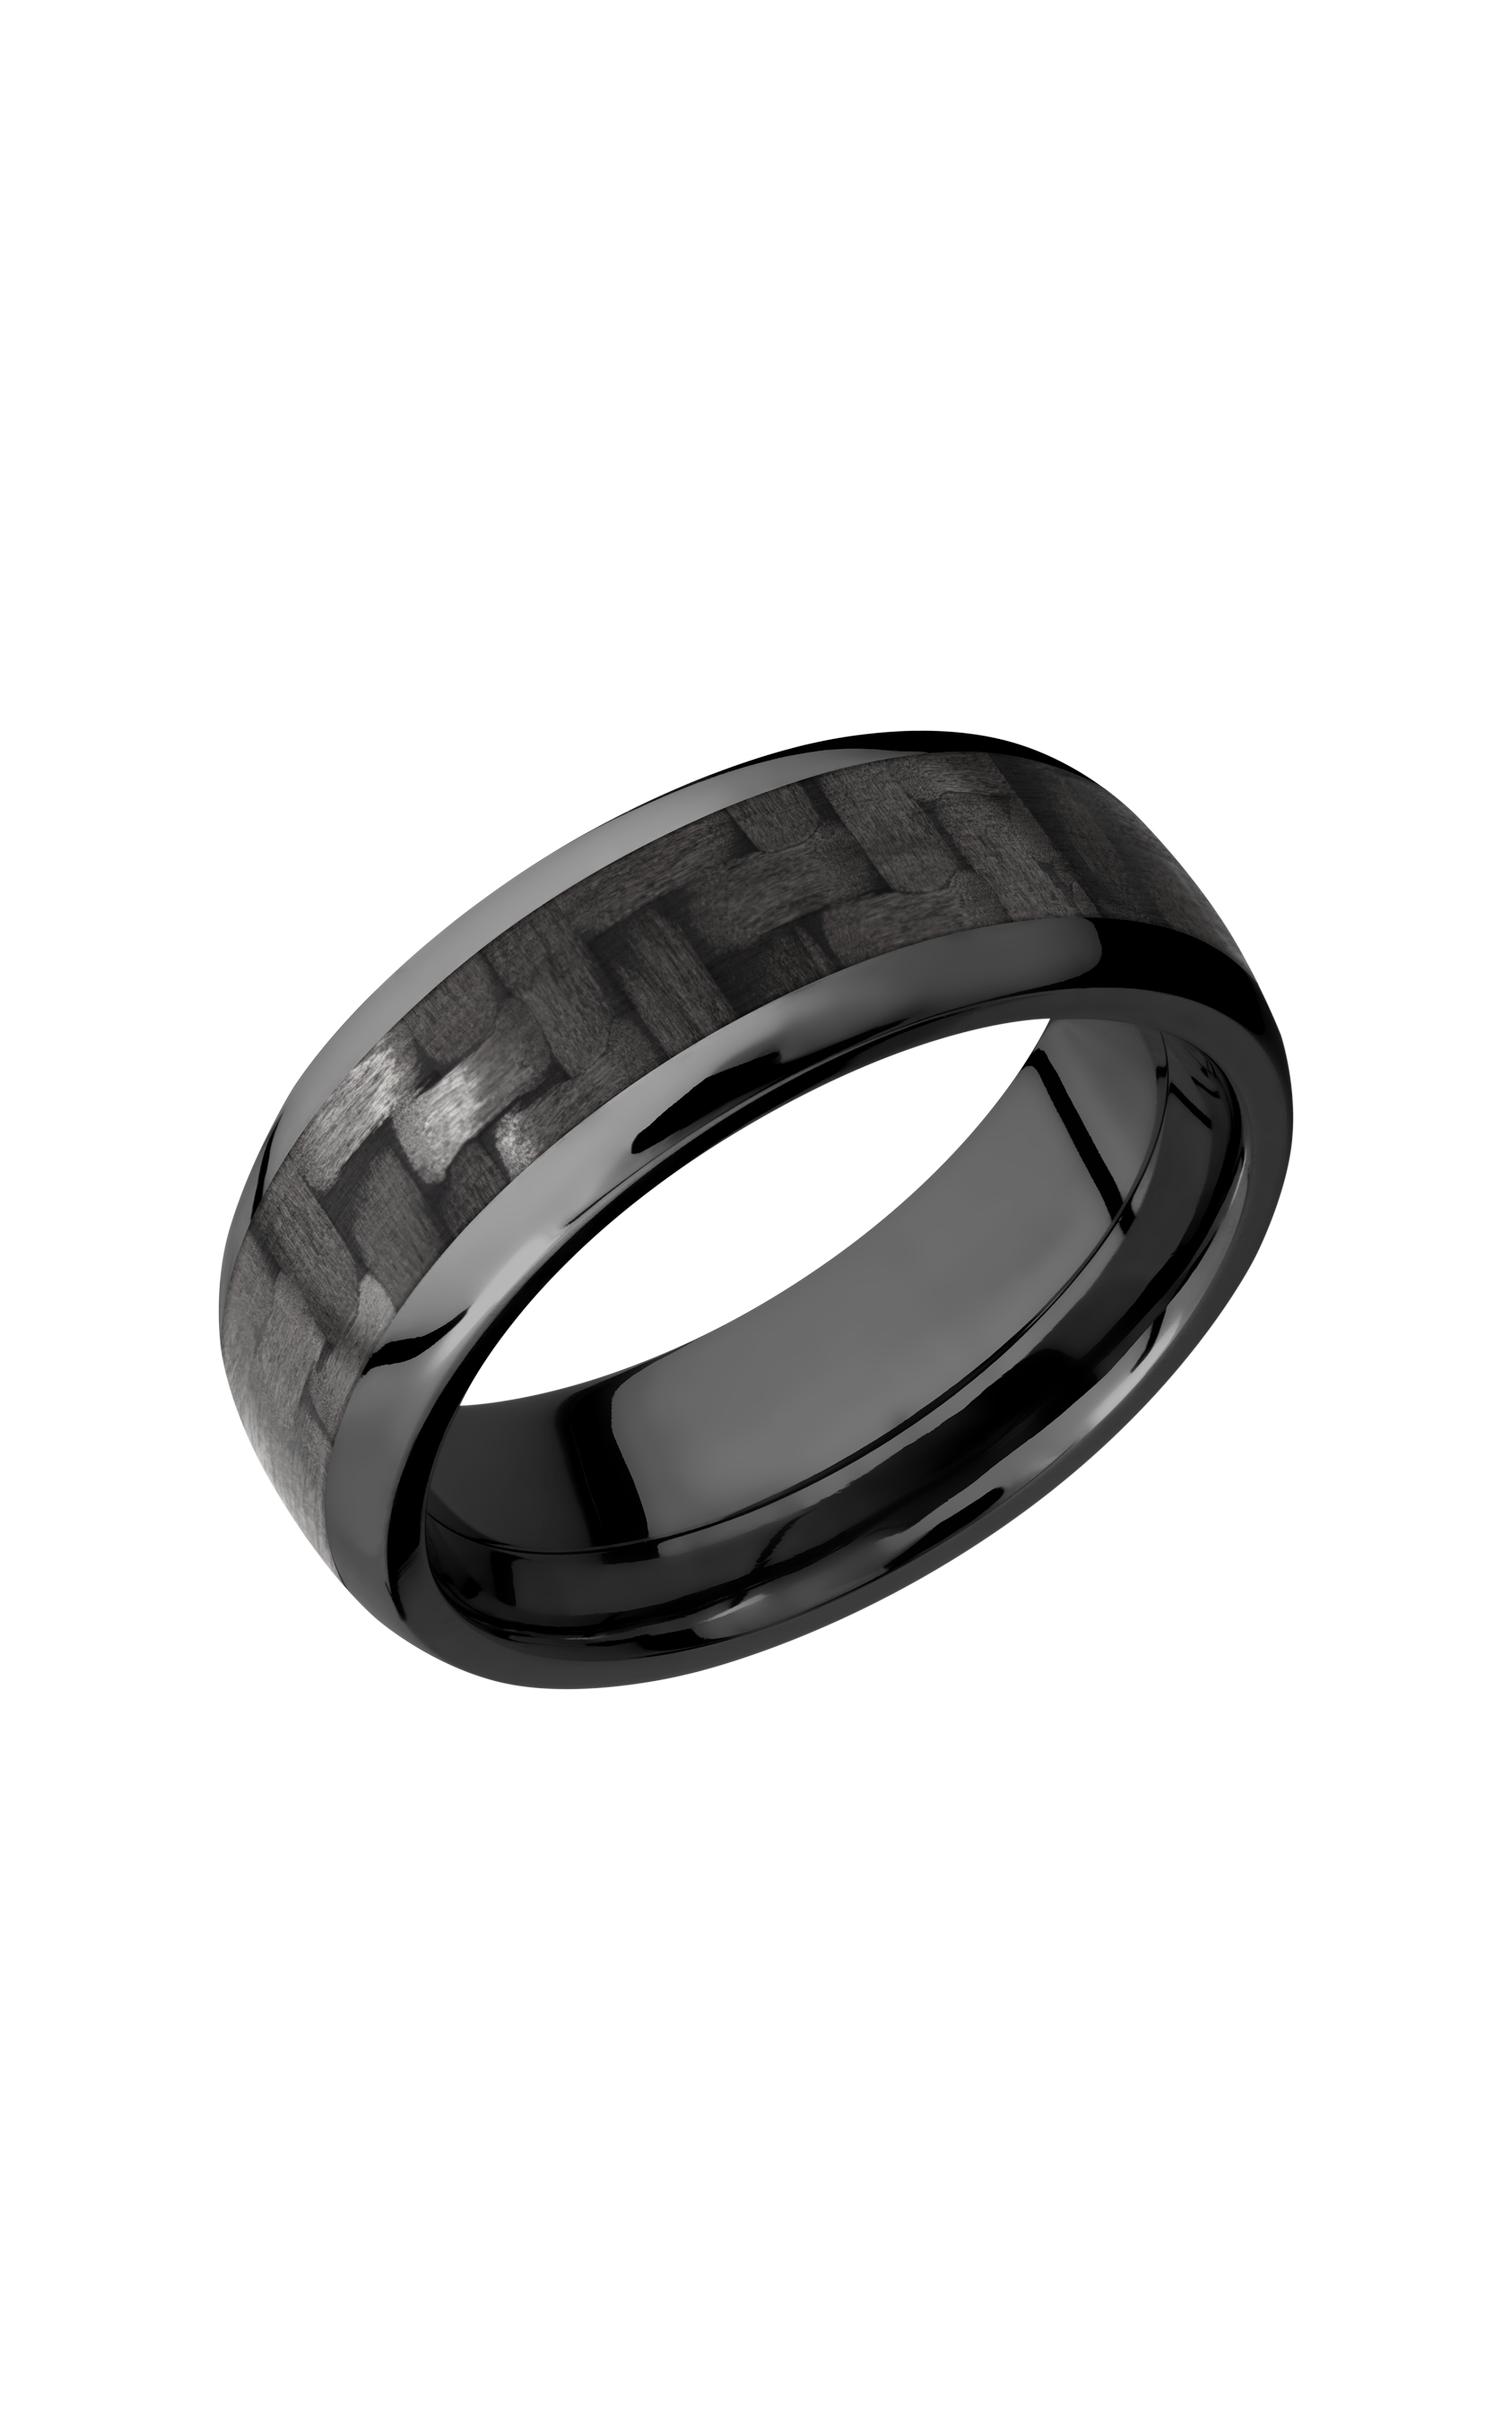 Lashbrook Carbon Fiber ZC8D15_CF product image